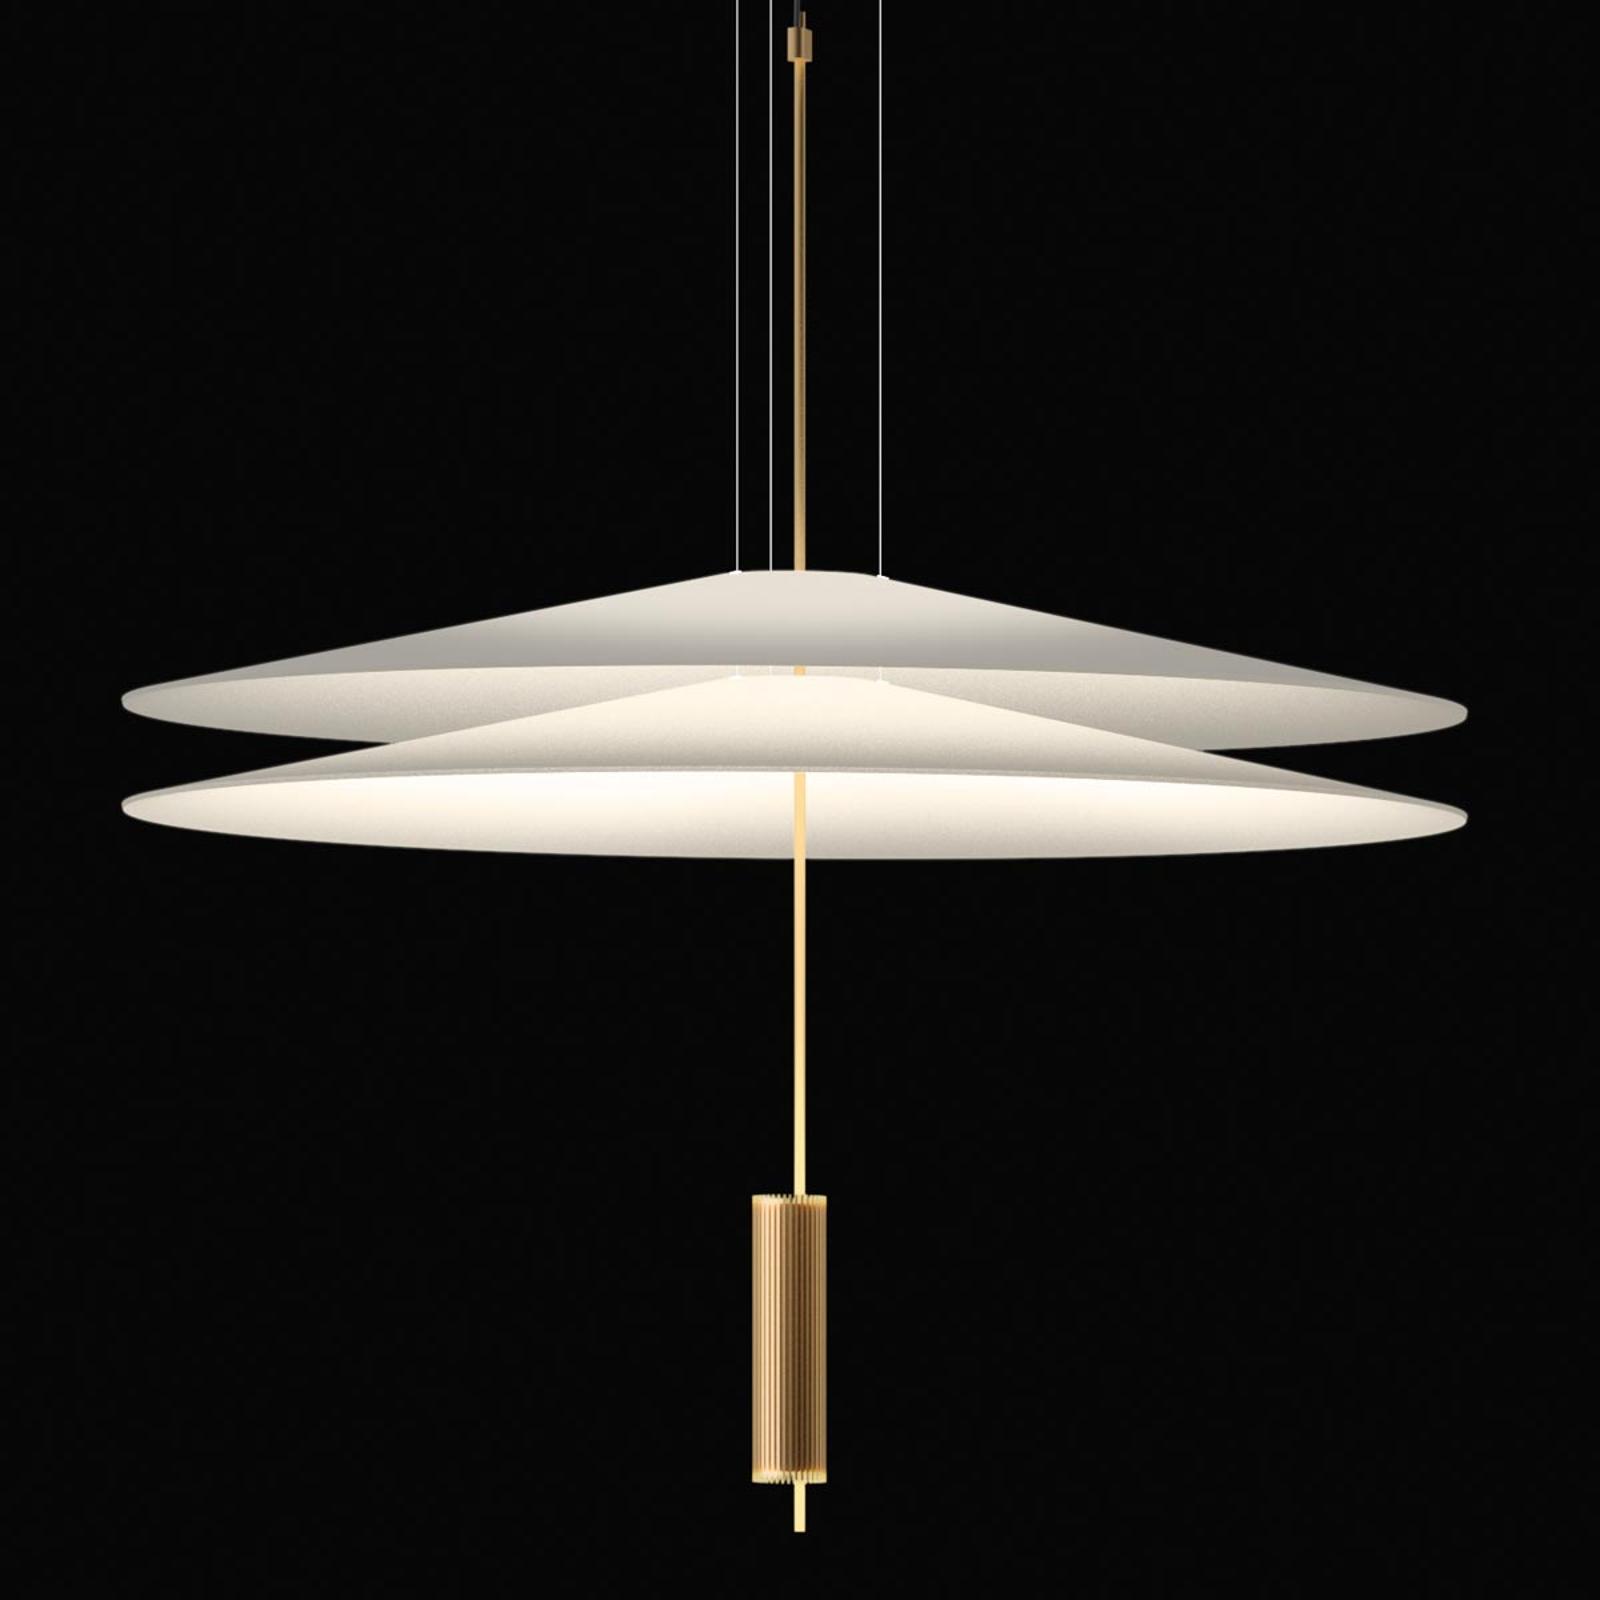 Szlachetna lampa wisząca LED Flamingo